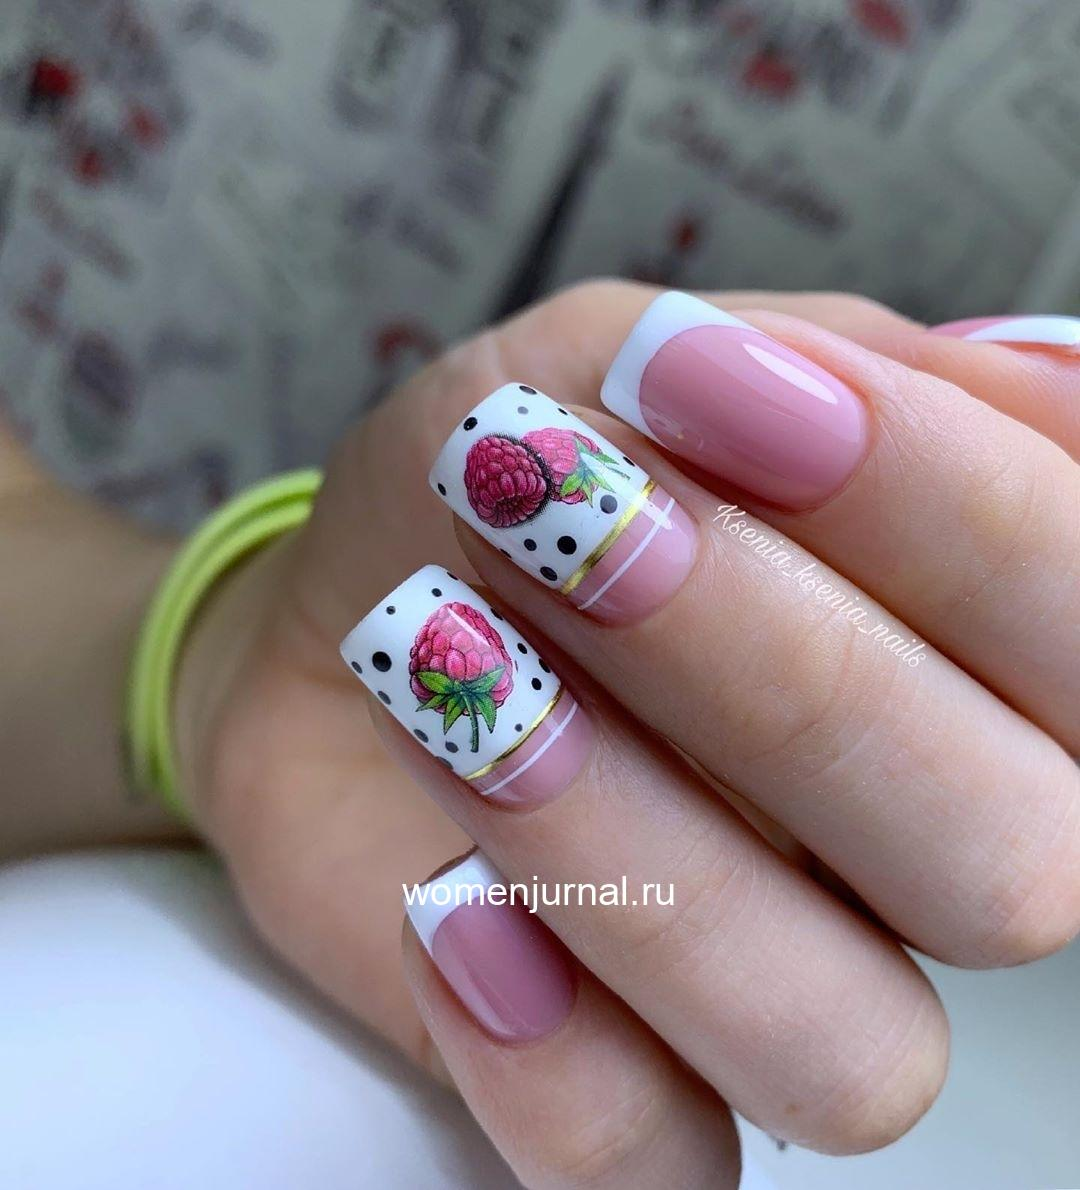 ideas_for_nailart_60122913_149815396068942_7101395427465752349_n-1-2691435